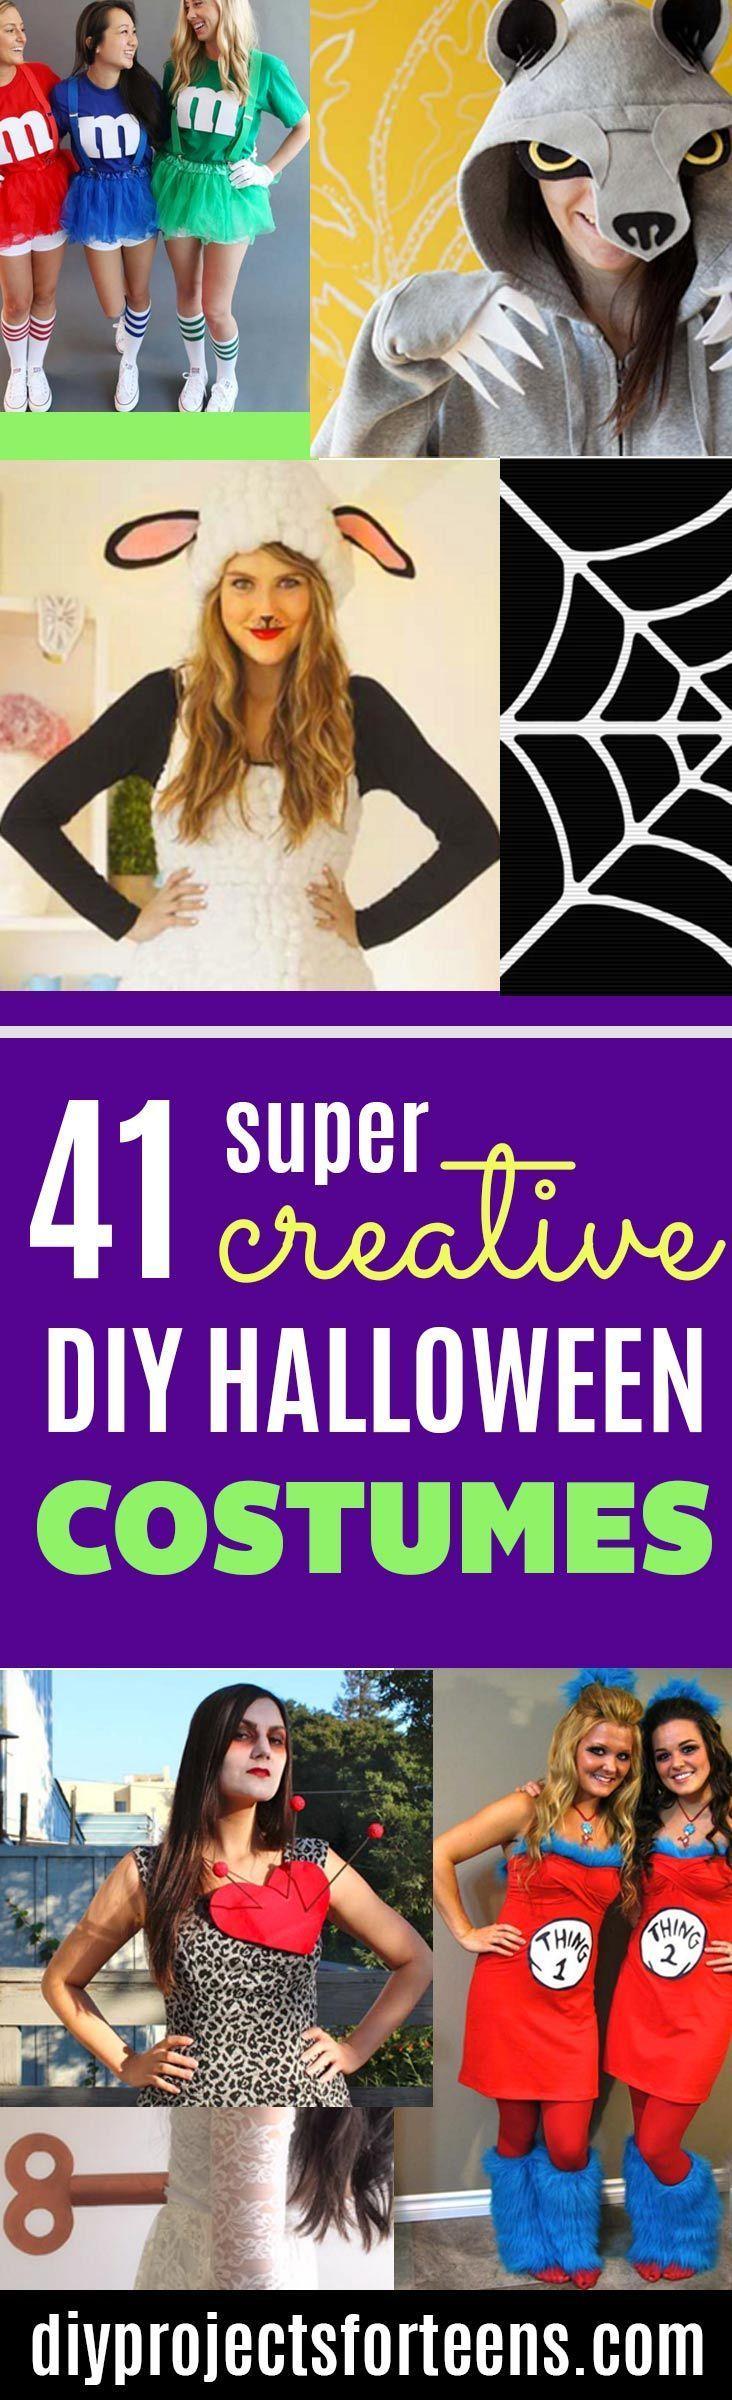 41 super creative diy halloween costumes for teens creative 41 super creative diy halloween costumes for teens diy projects for teens solutioingenieria Gallery